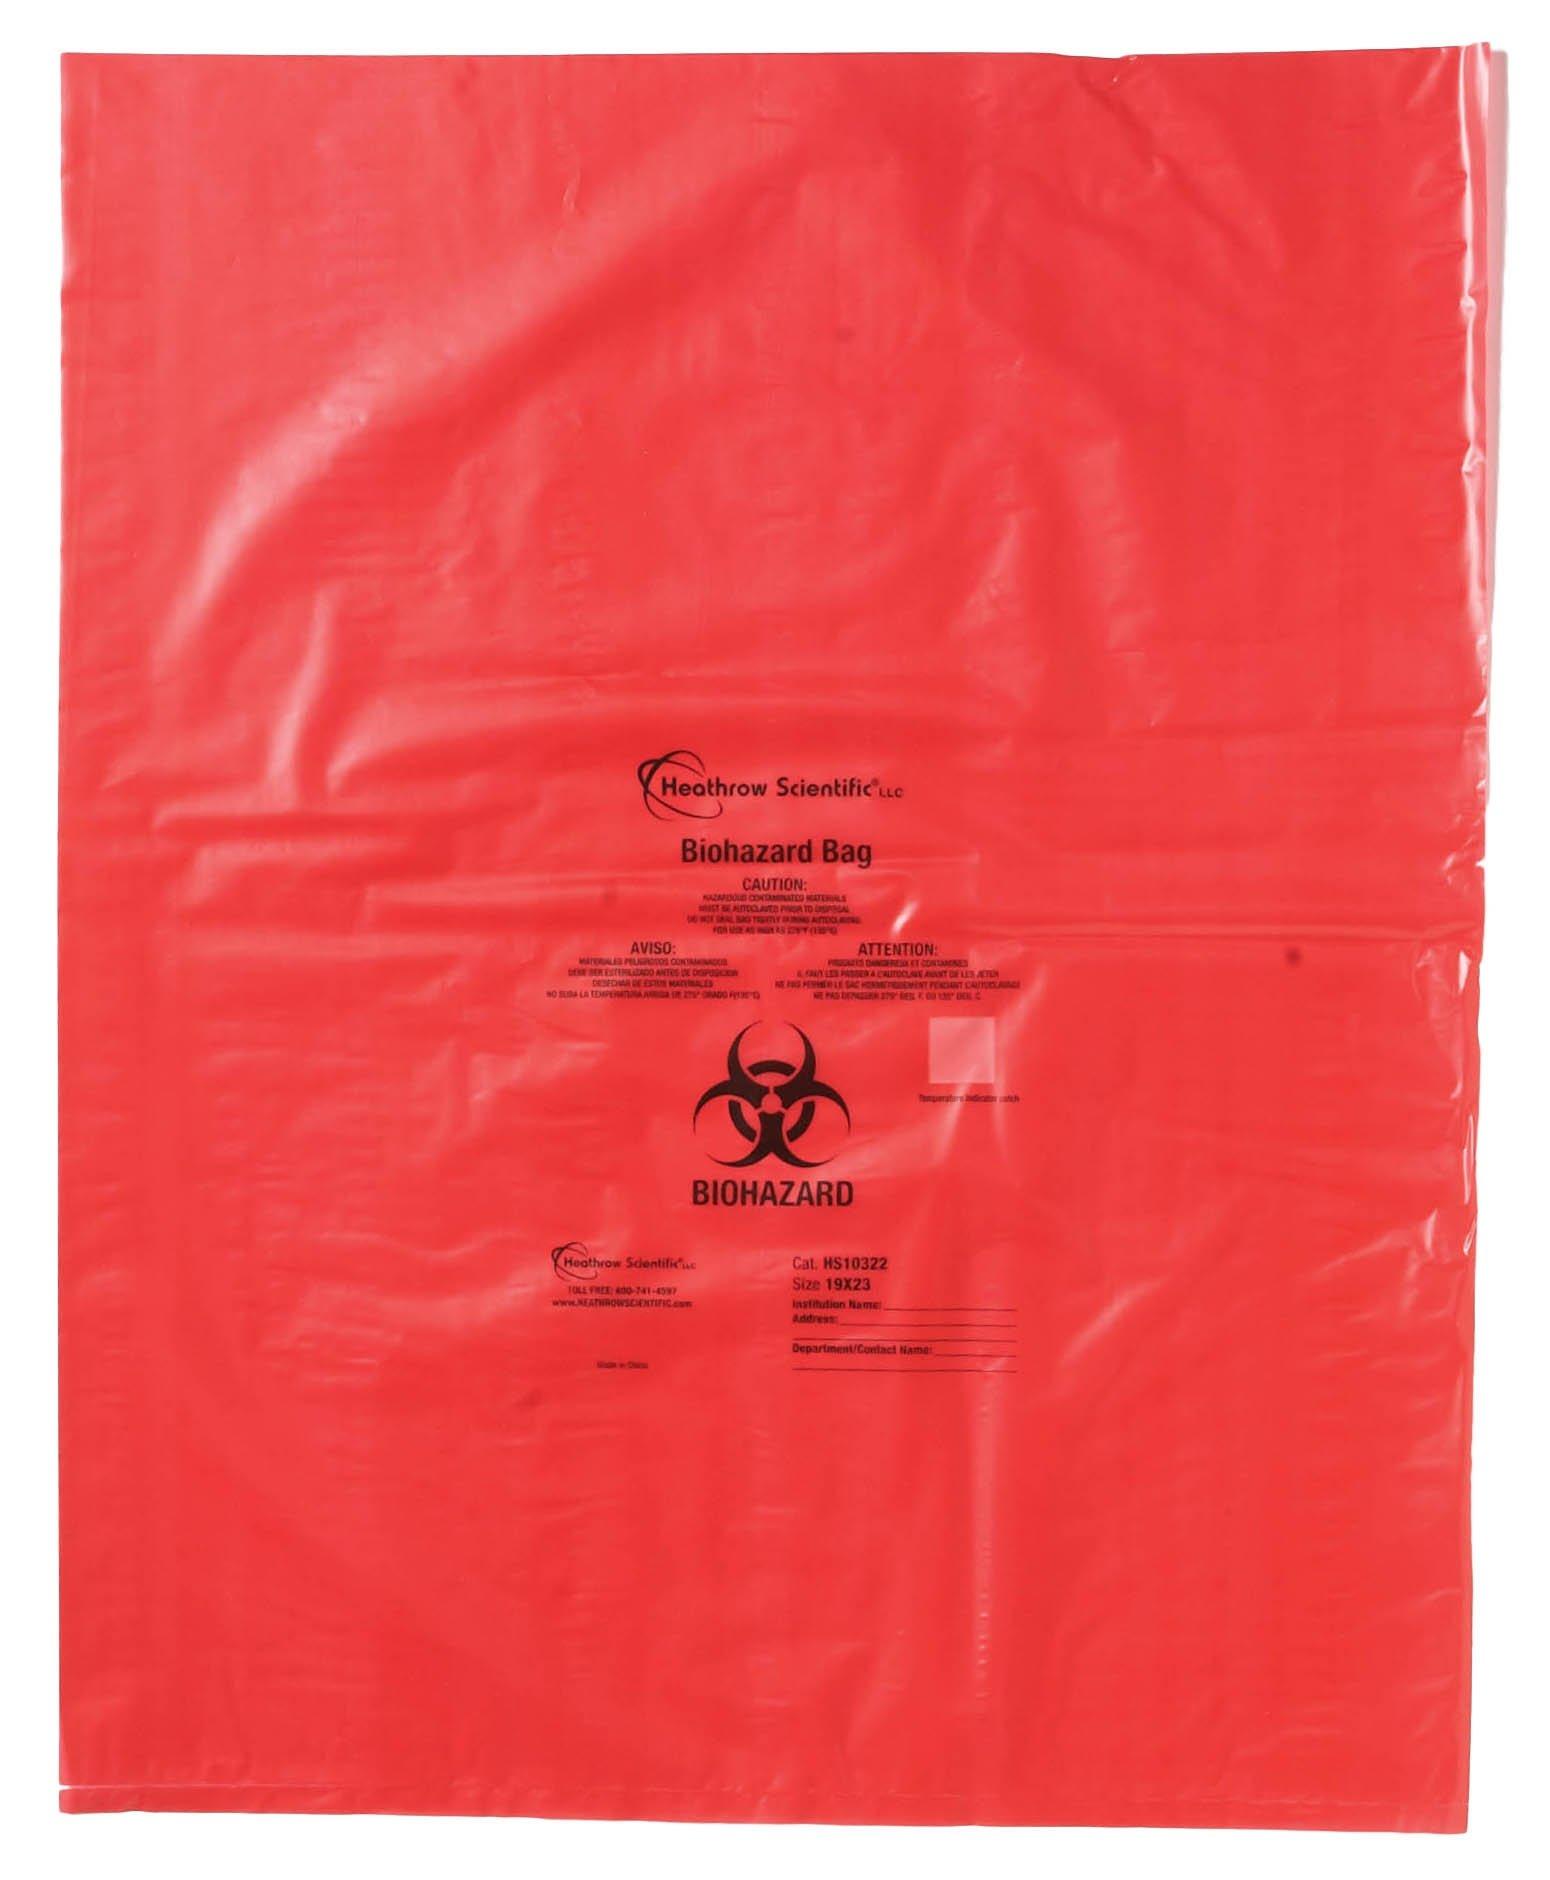 HS Biohazard Bags - 1.57mil Thick x 483mm W x 584mm L (19